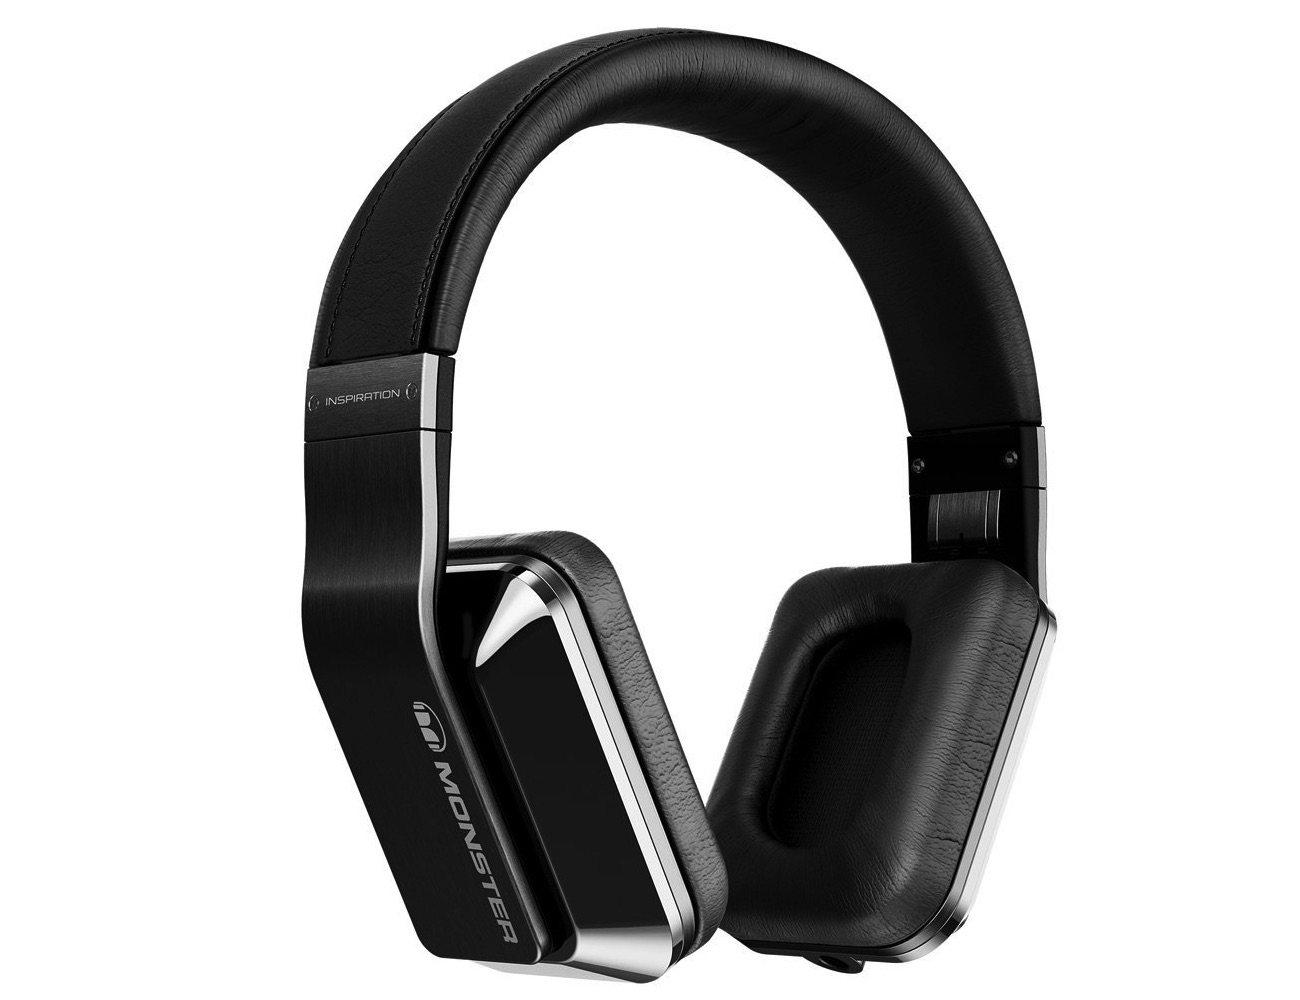 monster-inspiration-active-noise-canceling-over-ear-headphones-03